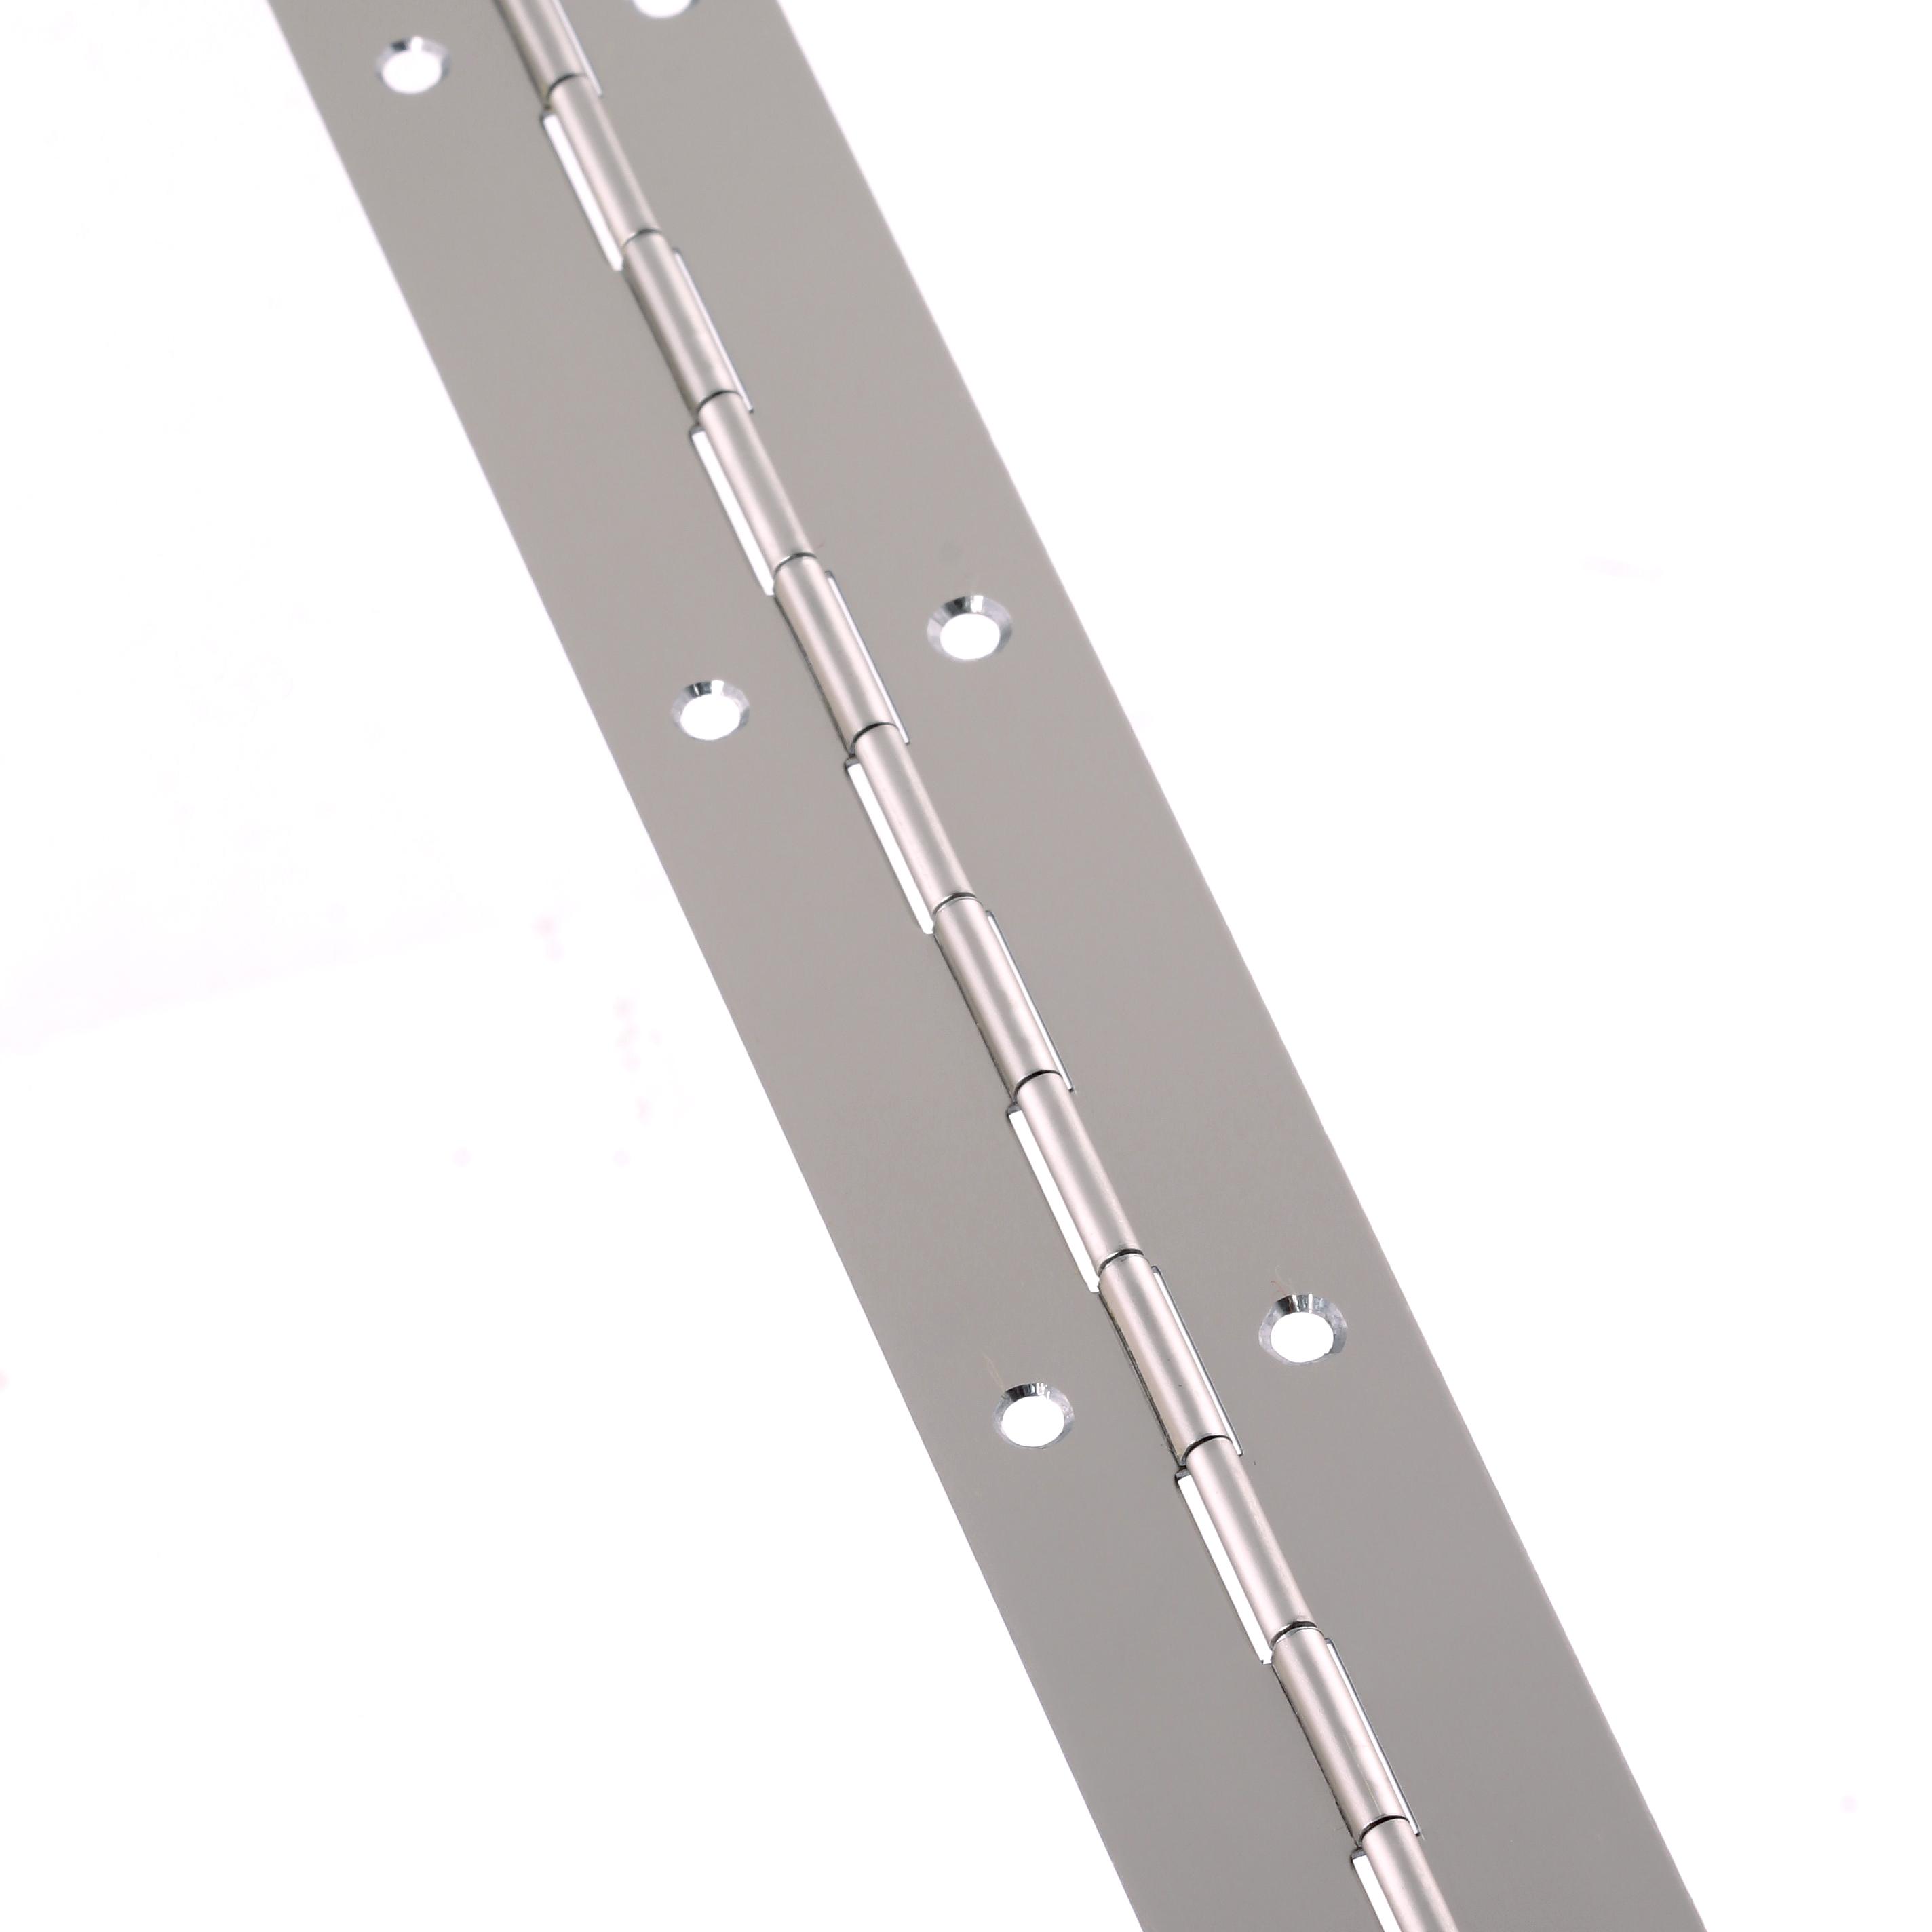 Steel Piano Hinge - 1800 x 32 x 0.7mm - Nickel Plated)